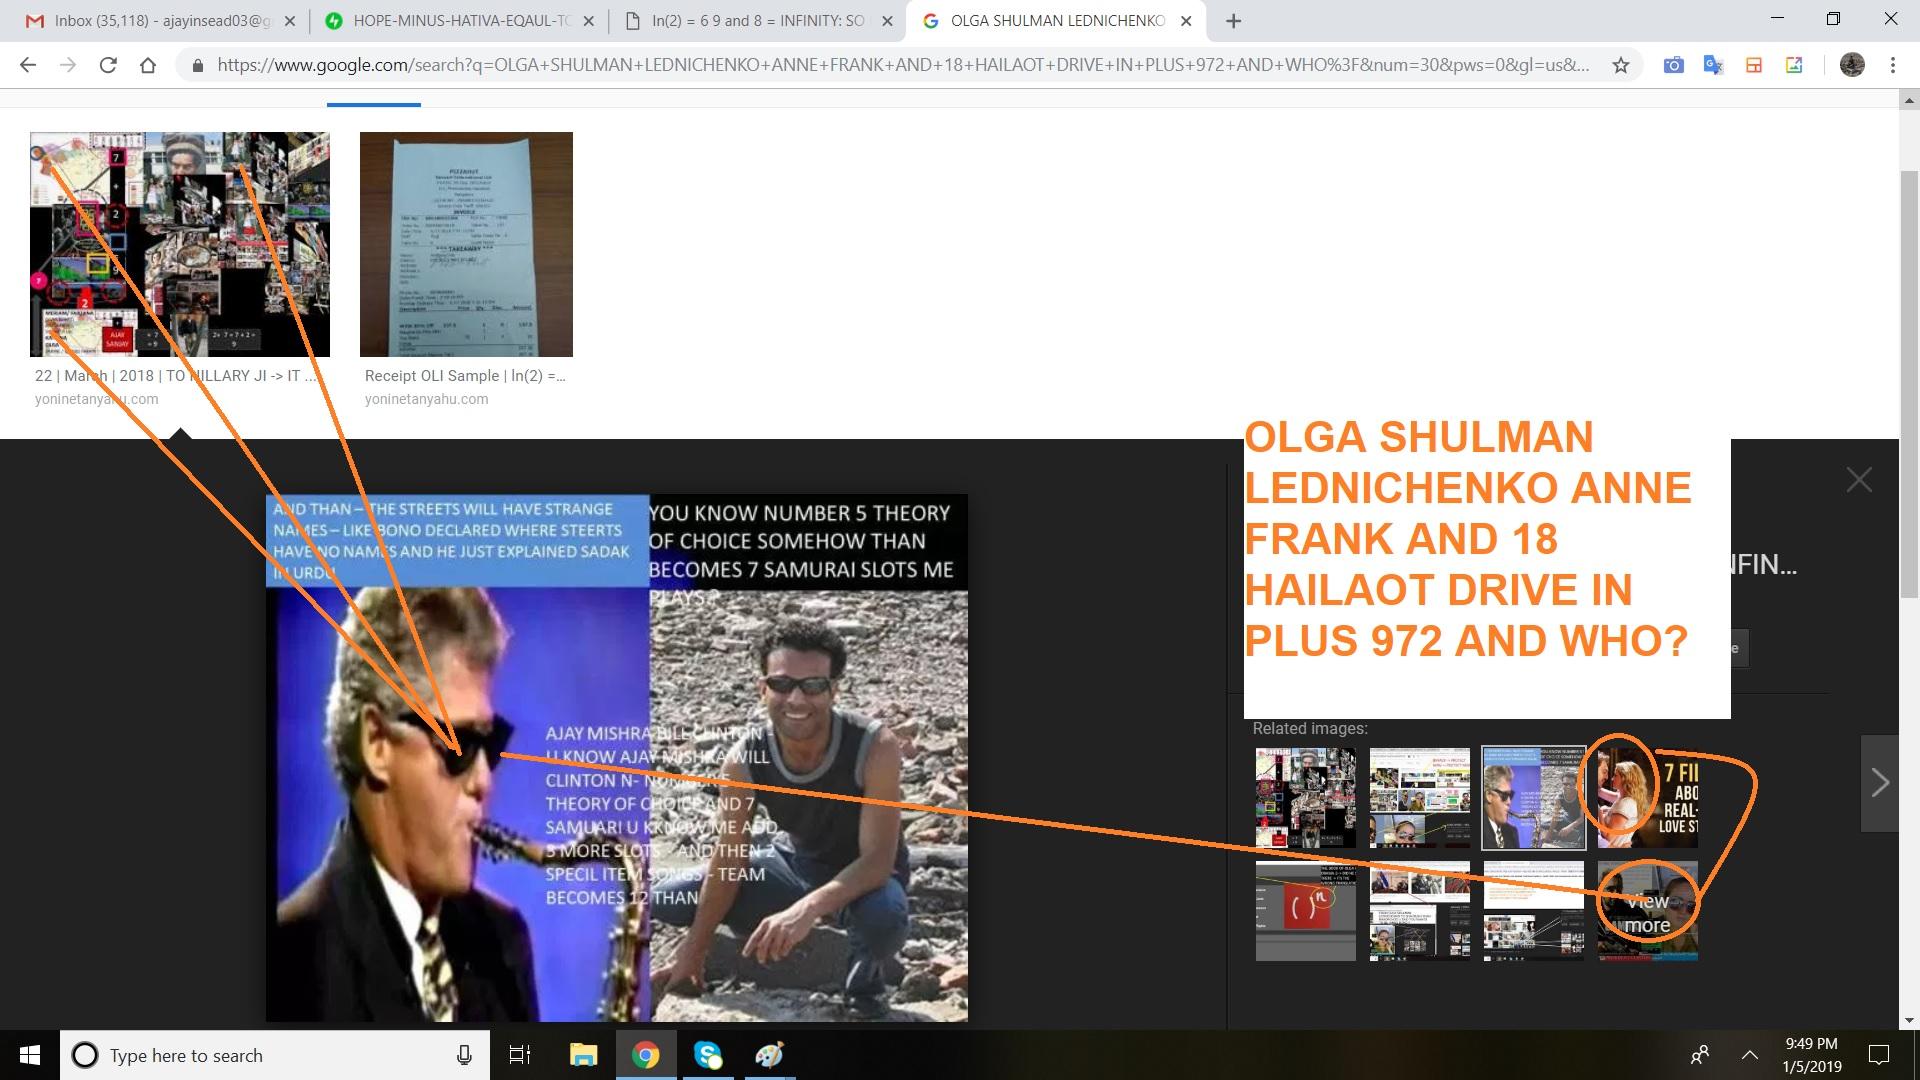 olga shulman lednichenko anne frank and 18 hailaot drive in plus 972 and who - p 3